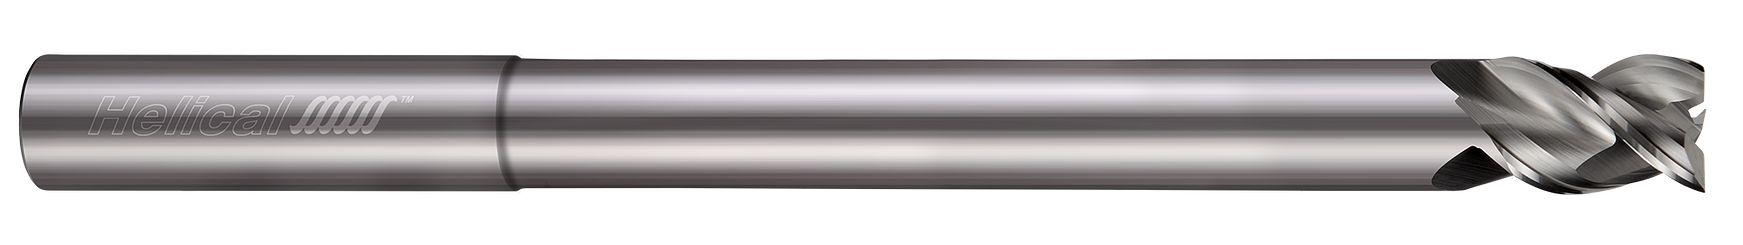 tool-details-19120